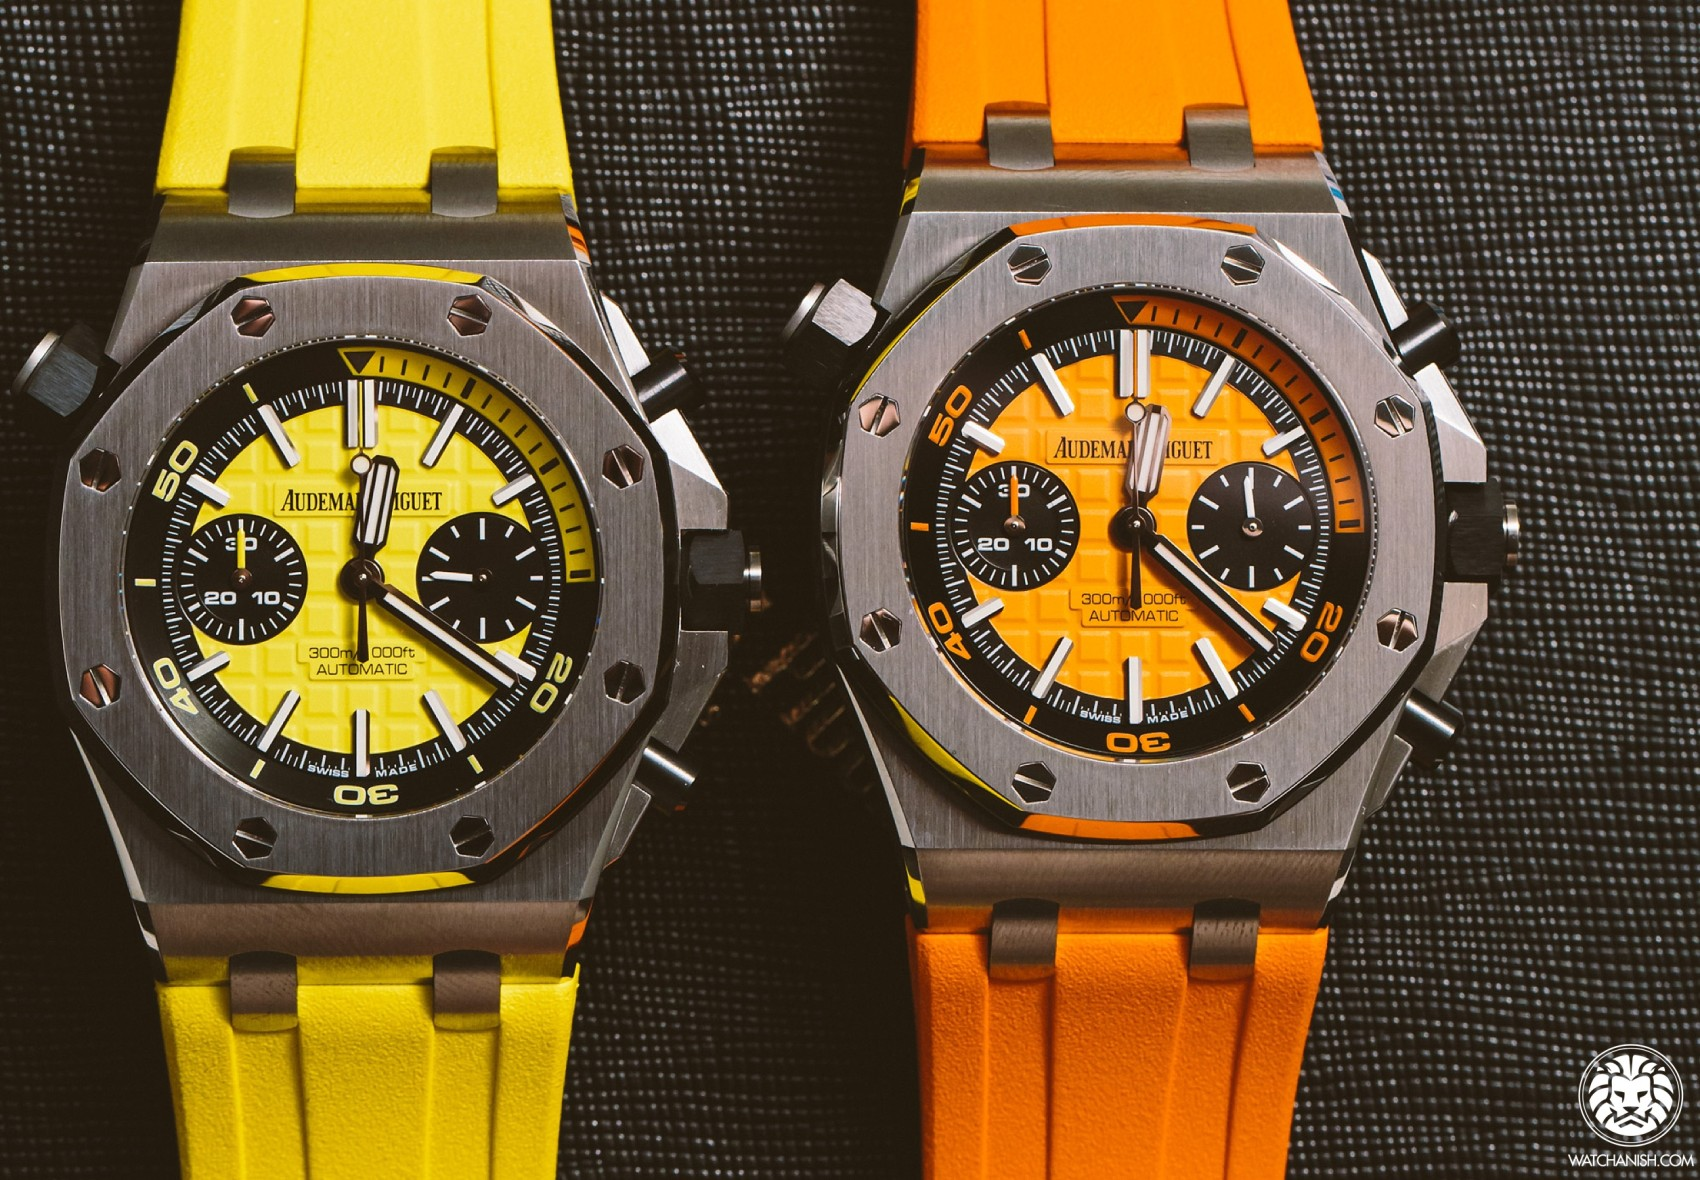 SIHH 2016 : New Audemars Piguet Royal Oak Offshore Diver Chronograph Replica Watch